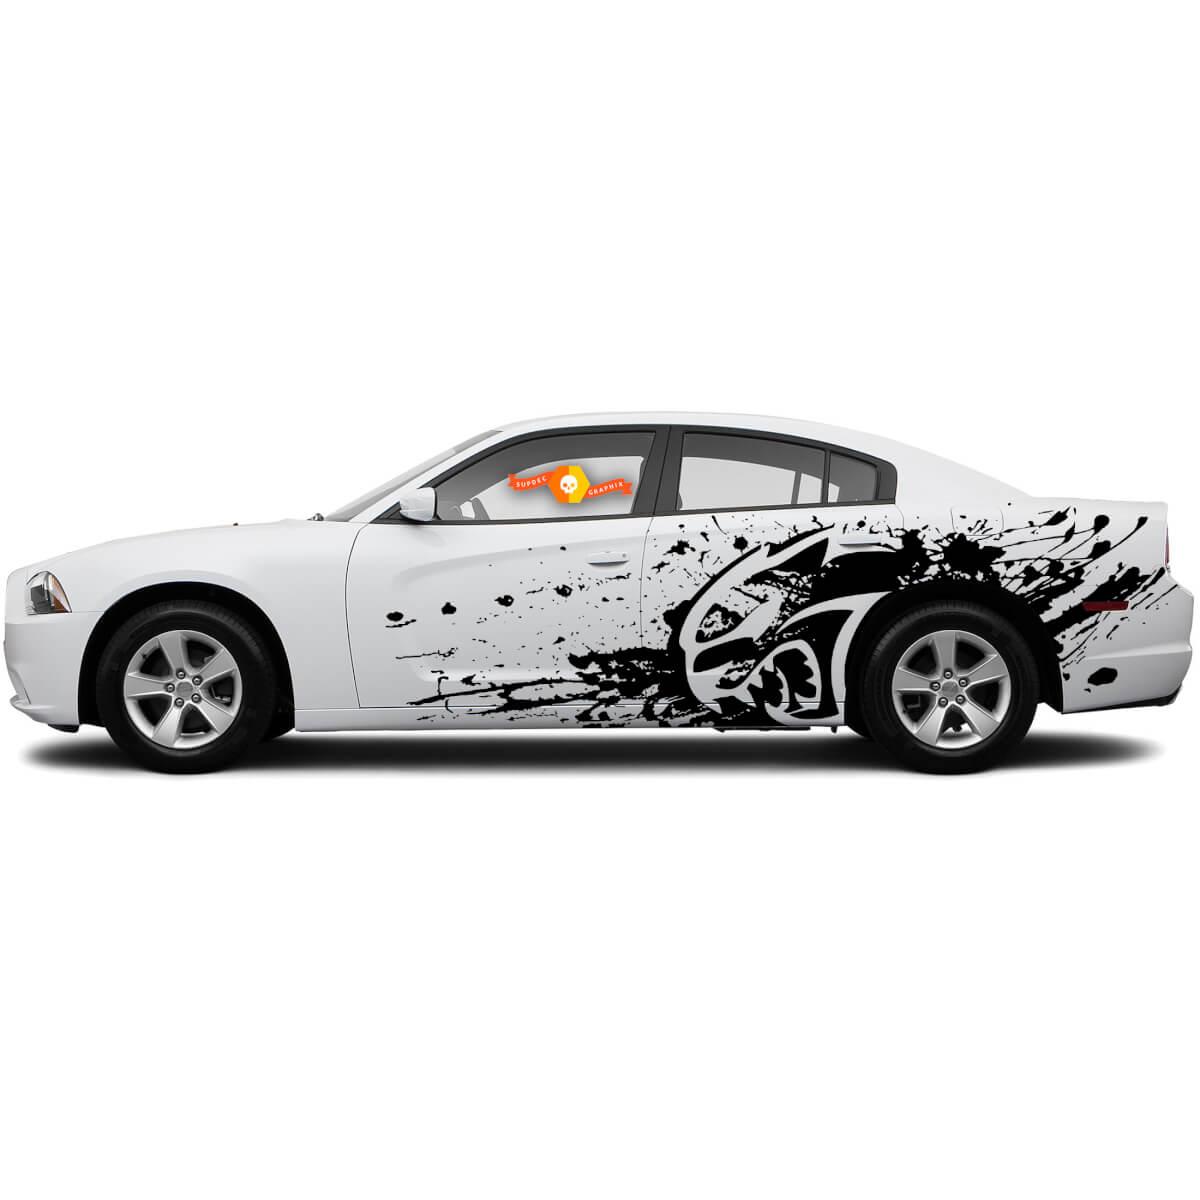 New Dodge Charger Hellcat style Splash Grunge Stripes Kit Vinyl Decal Graphic